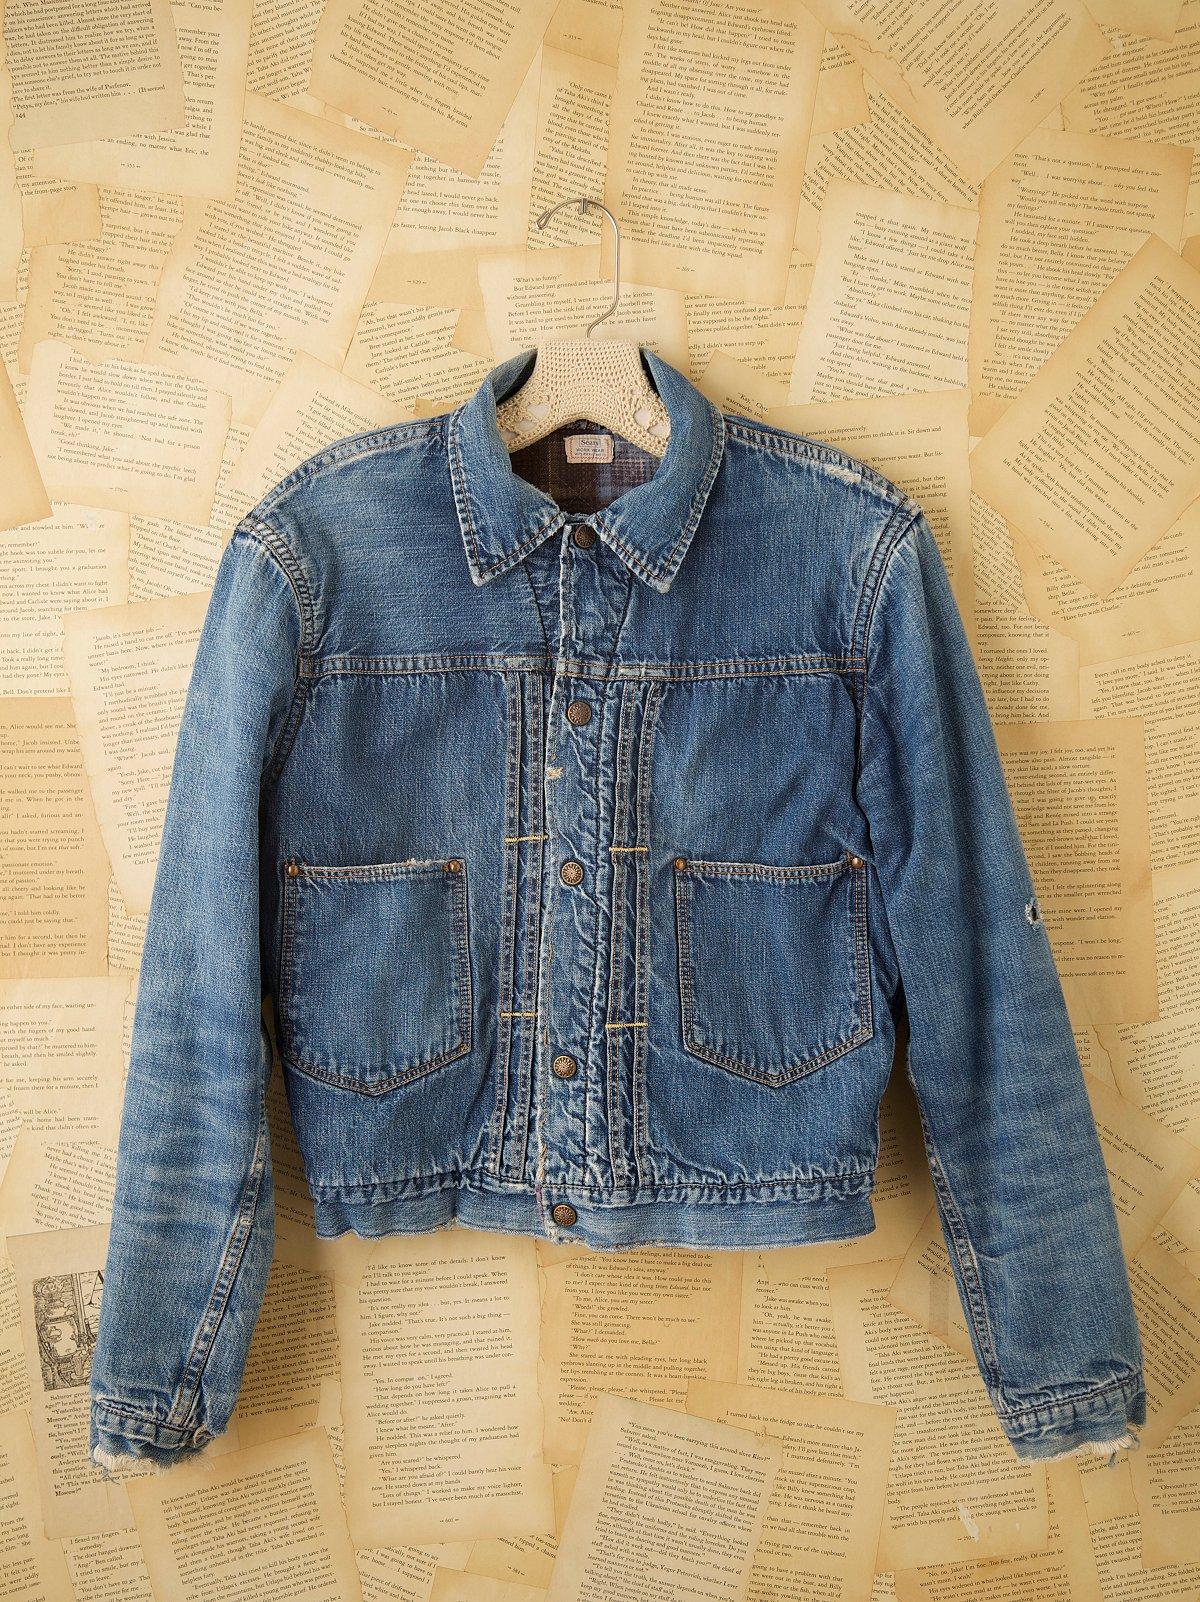 Vintage 1960s Jean Jacket